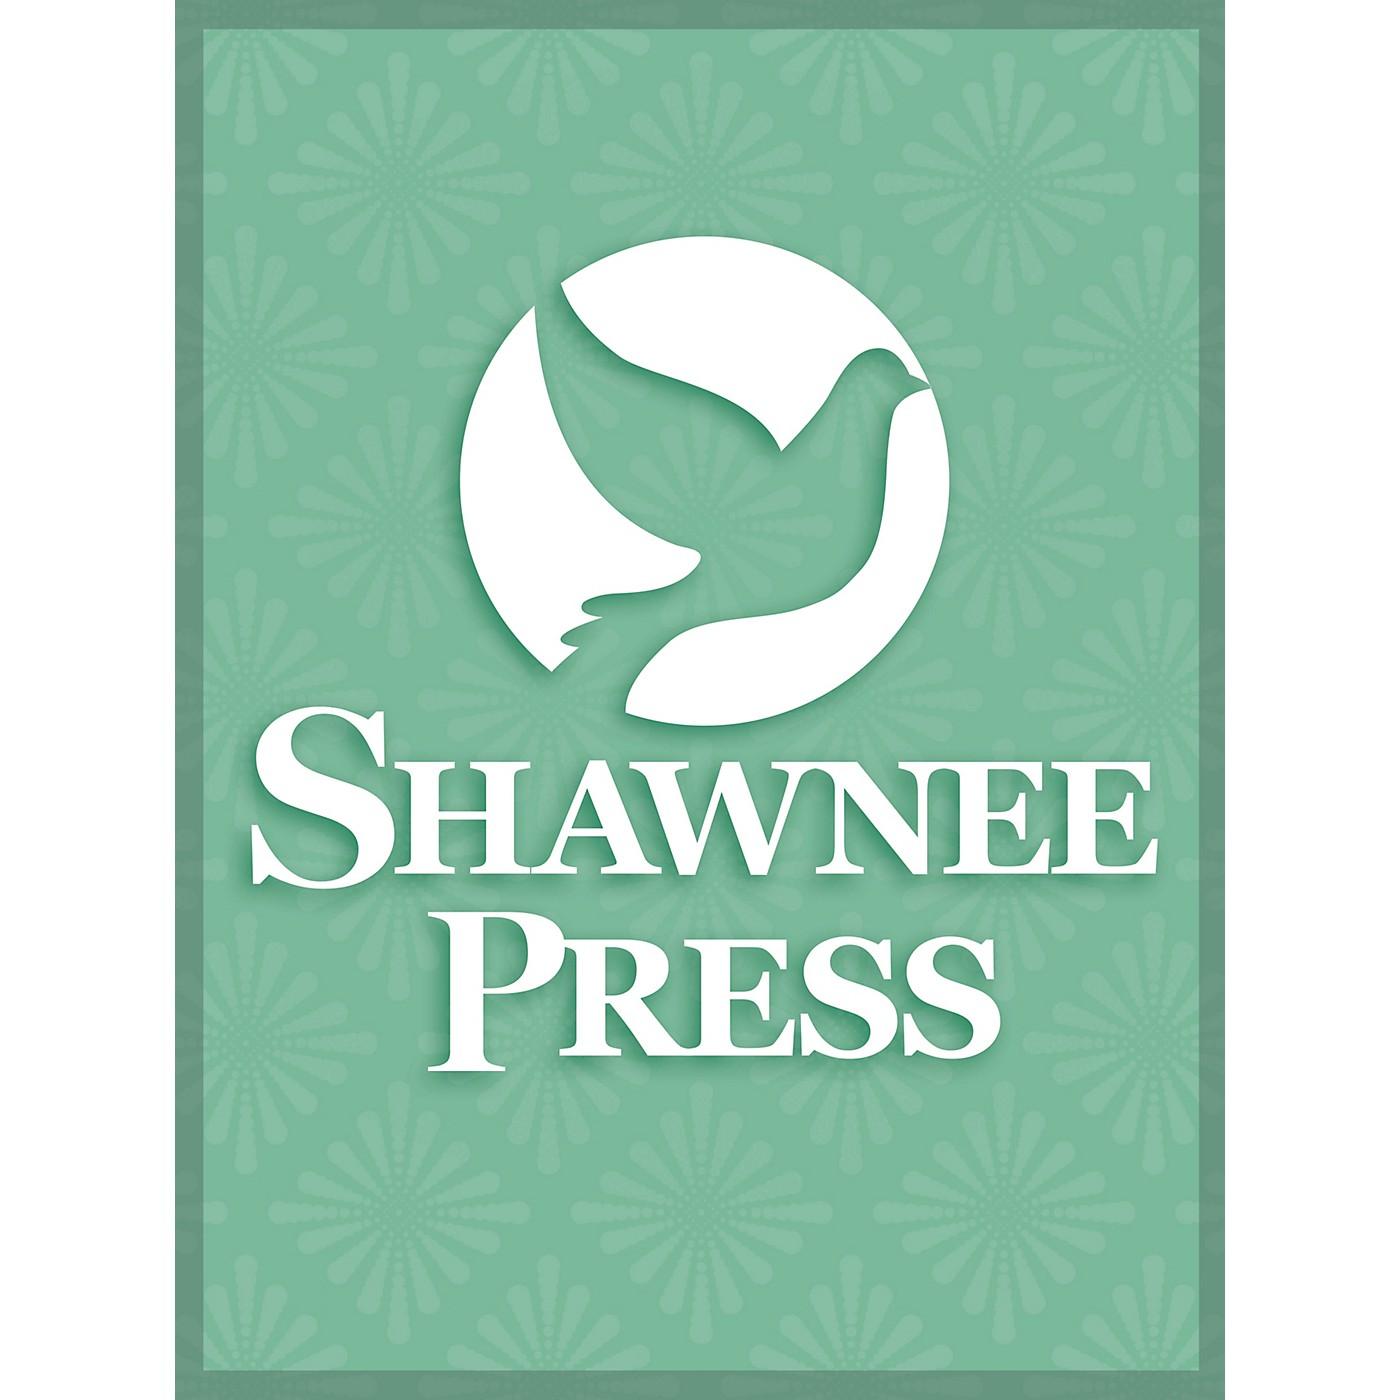 Shawnee Press Quartet for Flutes (Flute Quartet) Shawnee Press Series Composed by Carol Butts thumbnail